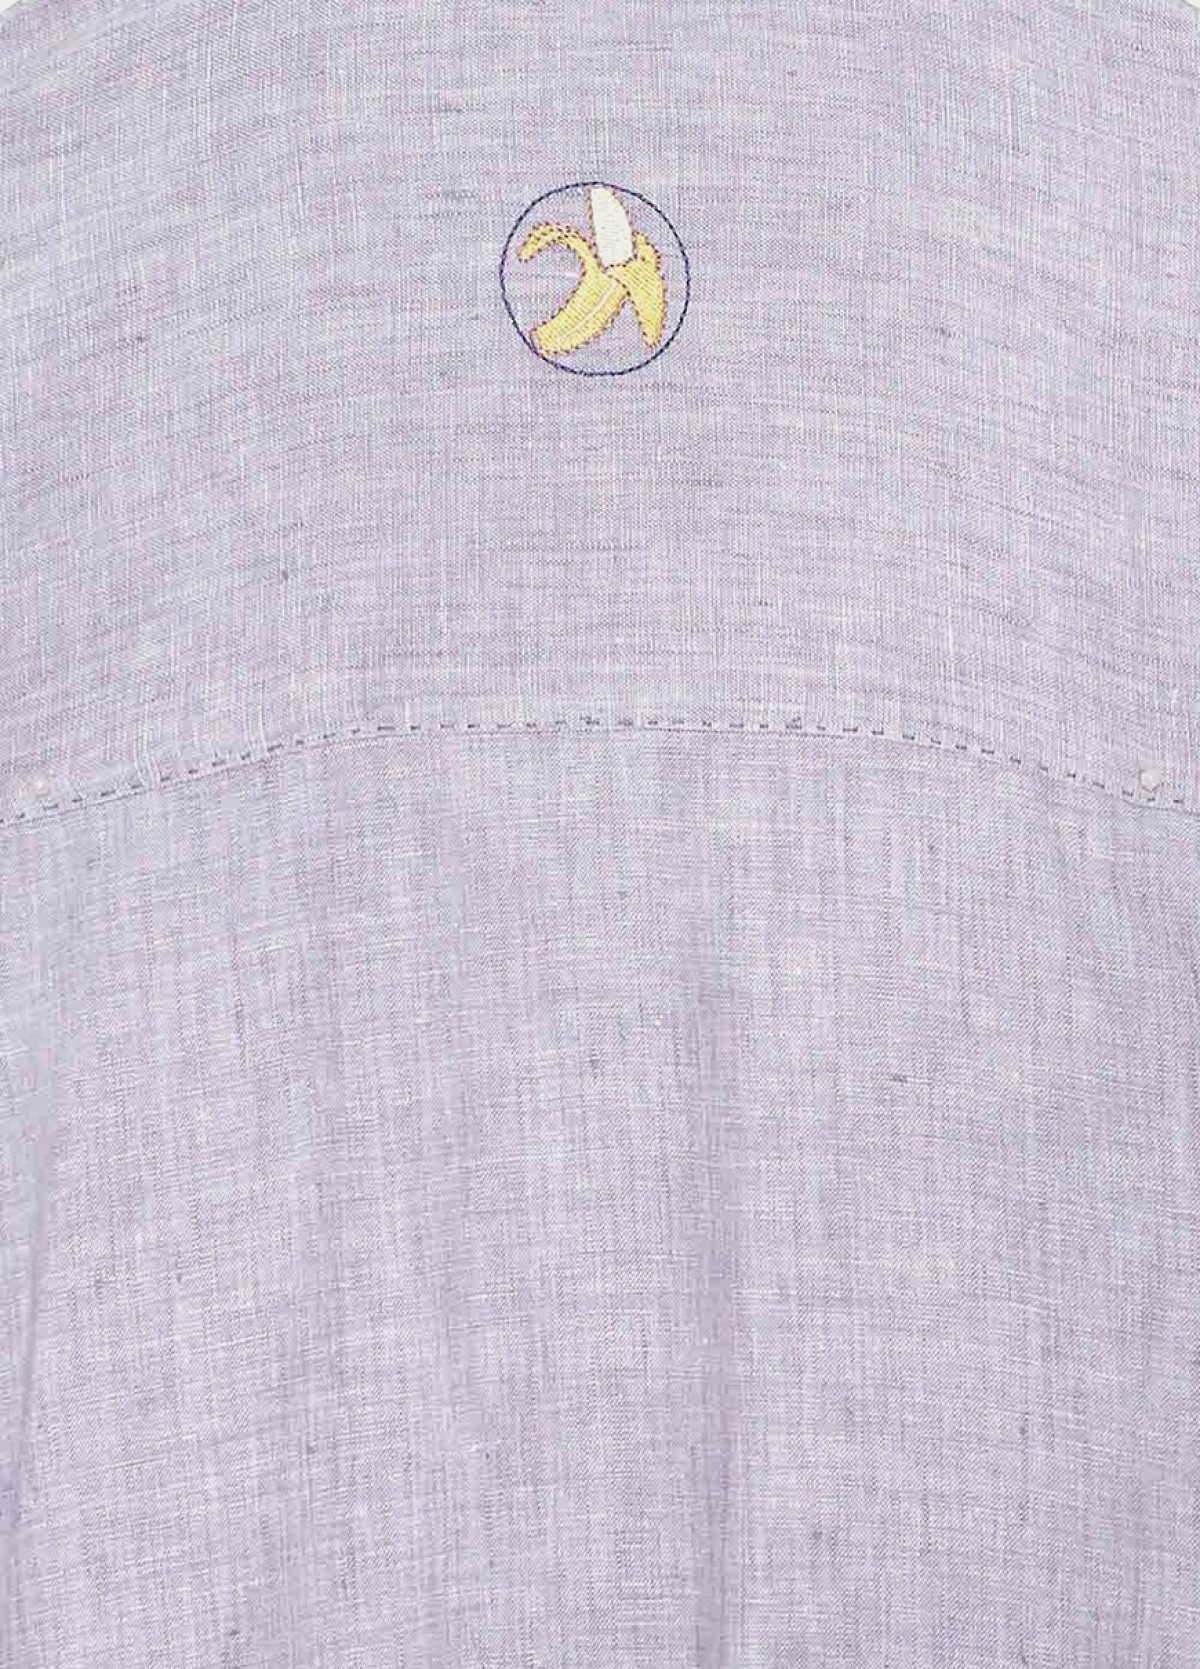 The Banana Beings Shirt